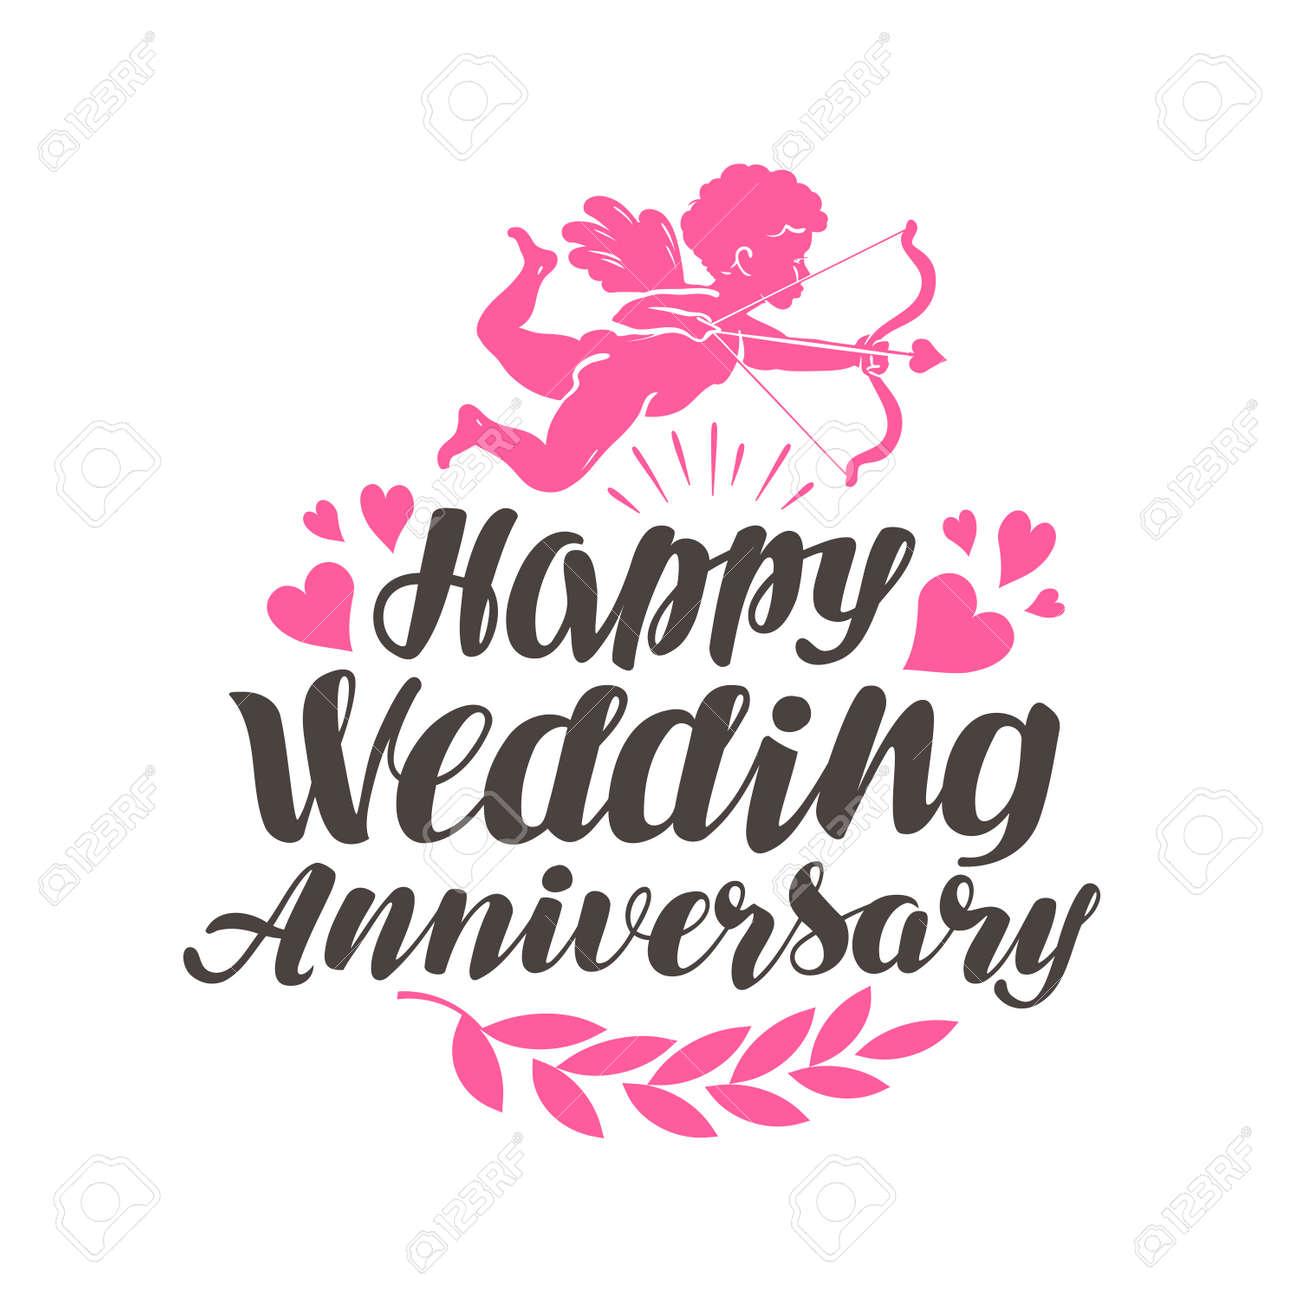 happy wedding anniversary card illustration royalty free cliparts